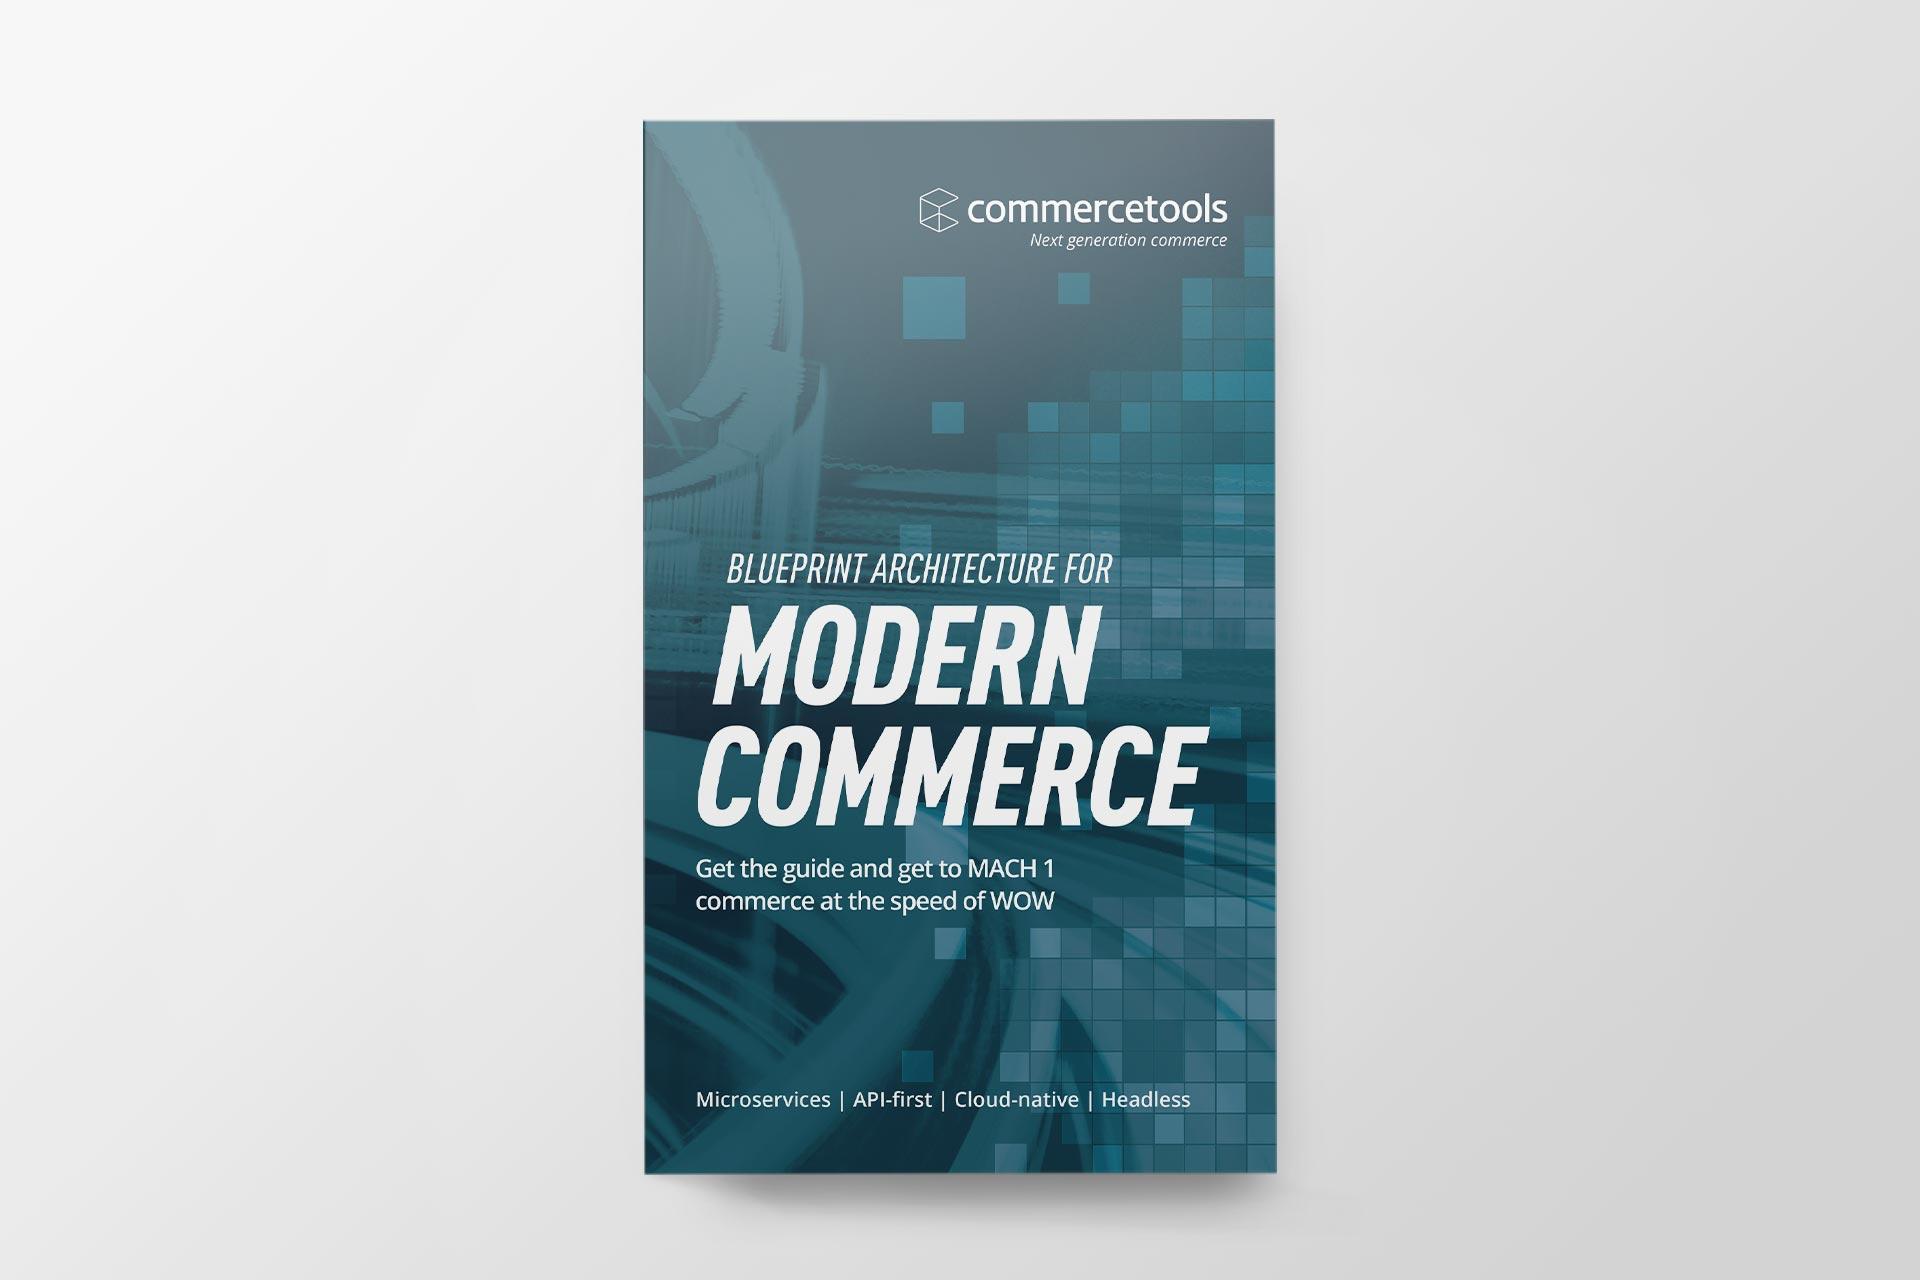 BON_COM_shoptalk_2019_blueprint_brochure_cover.jpg